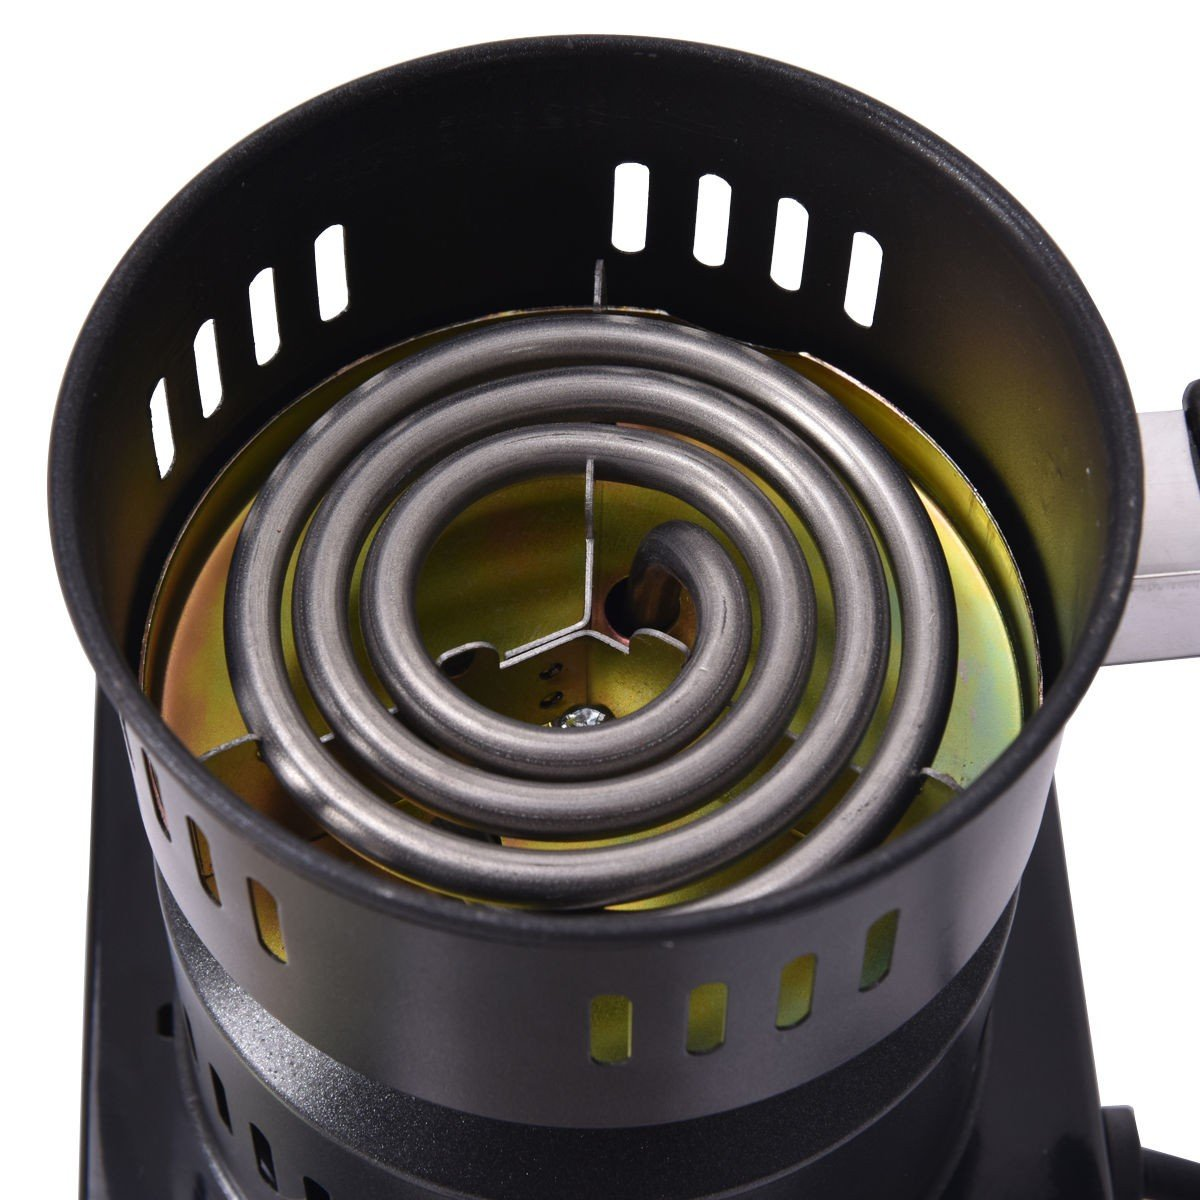 Electric Charcoal Starter Hookah Shisha Nargila Heater Stove Charcoal Burner Costway by COSTWAY (Image #5)